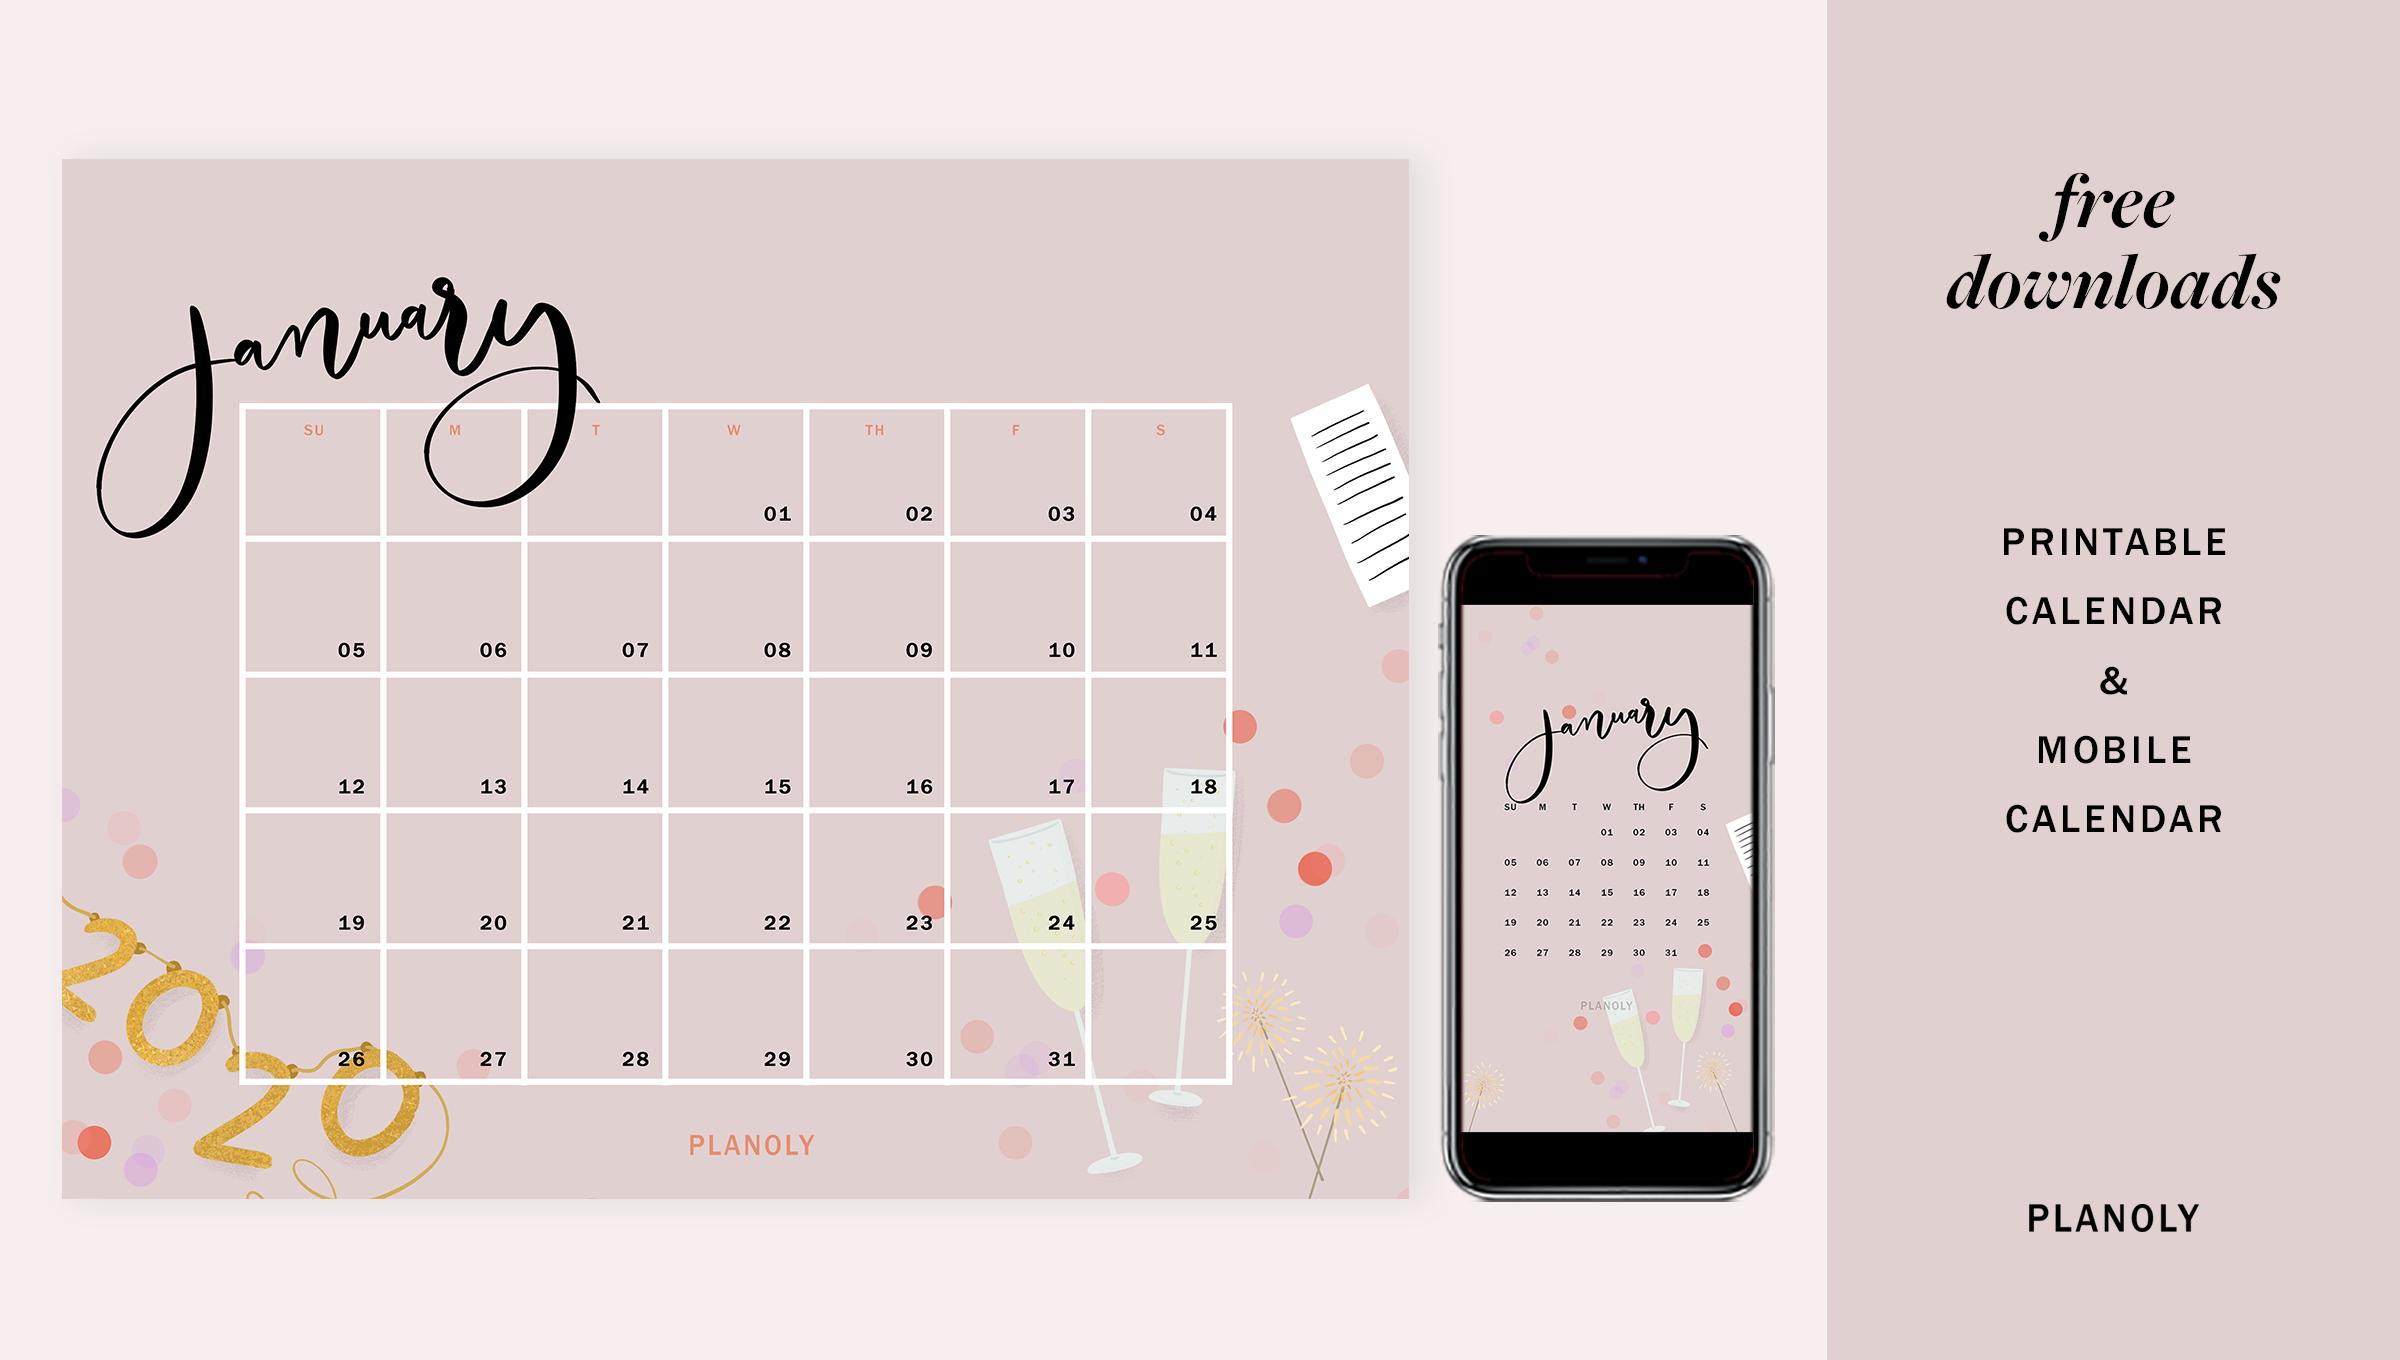 Q1 2020 Content Calendars